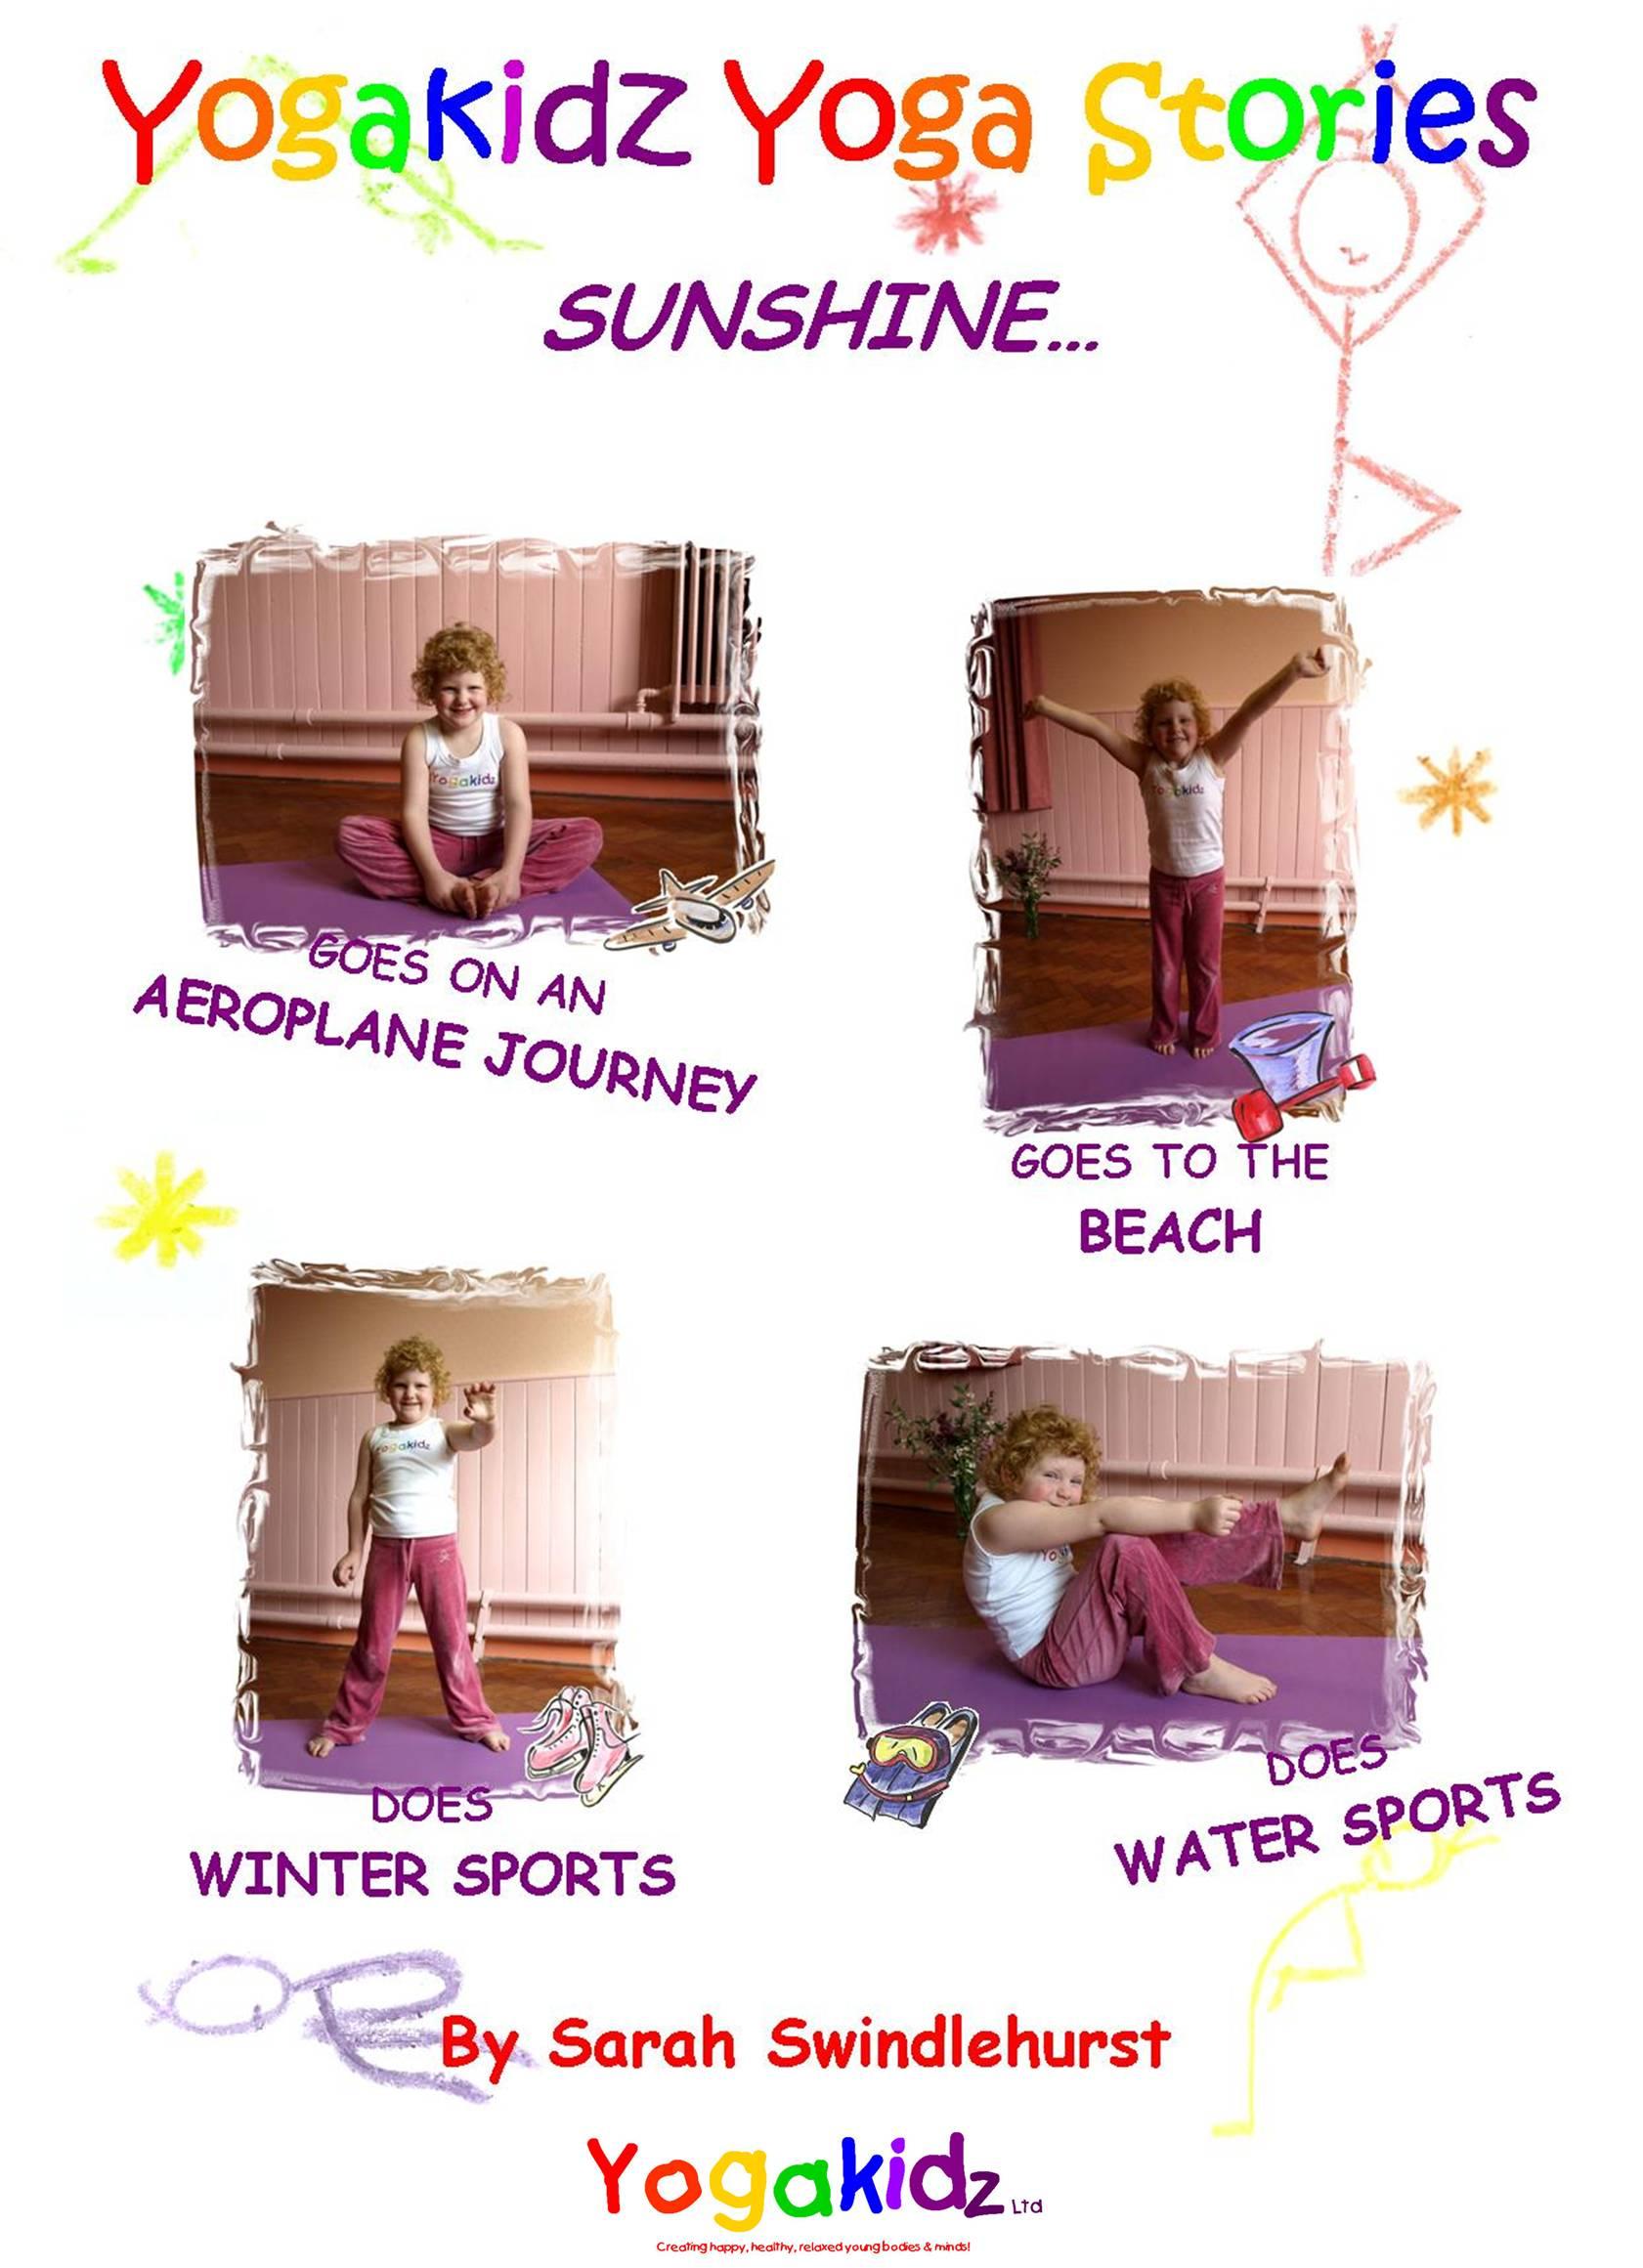 Yogakidz Yoga Stories - Sunshine PDF Version